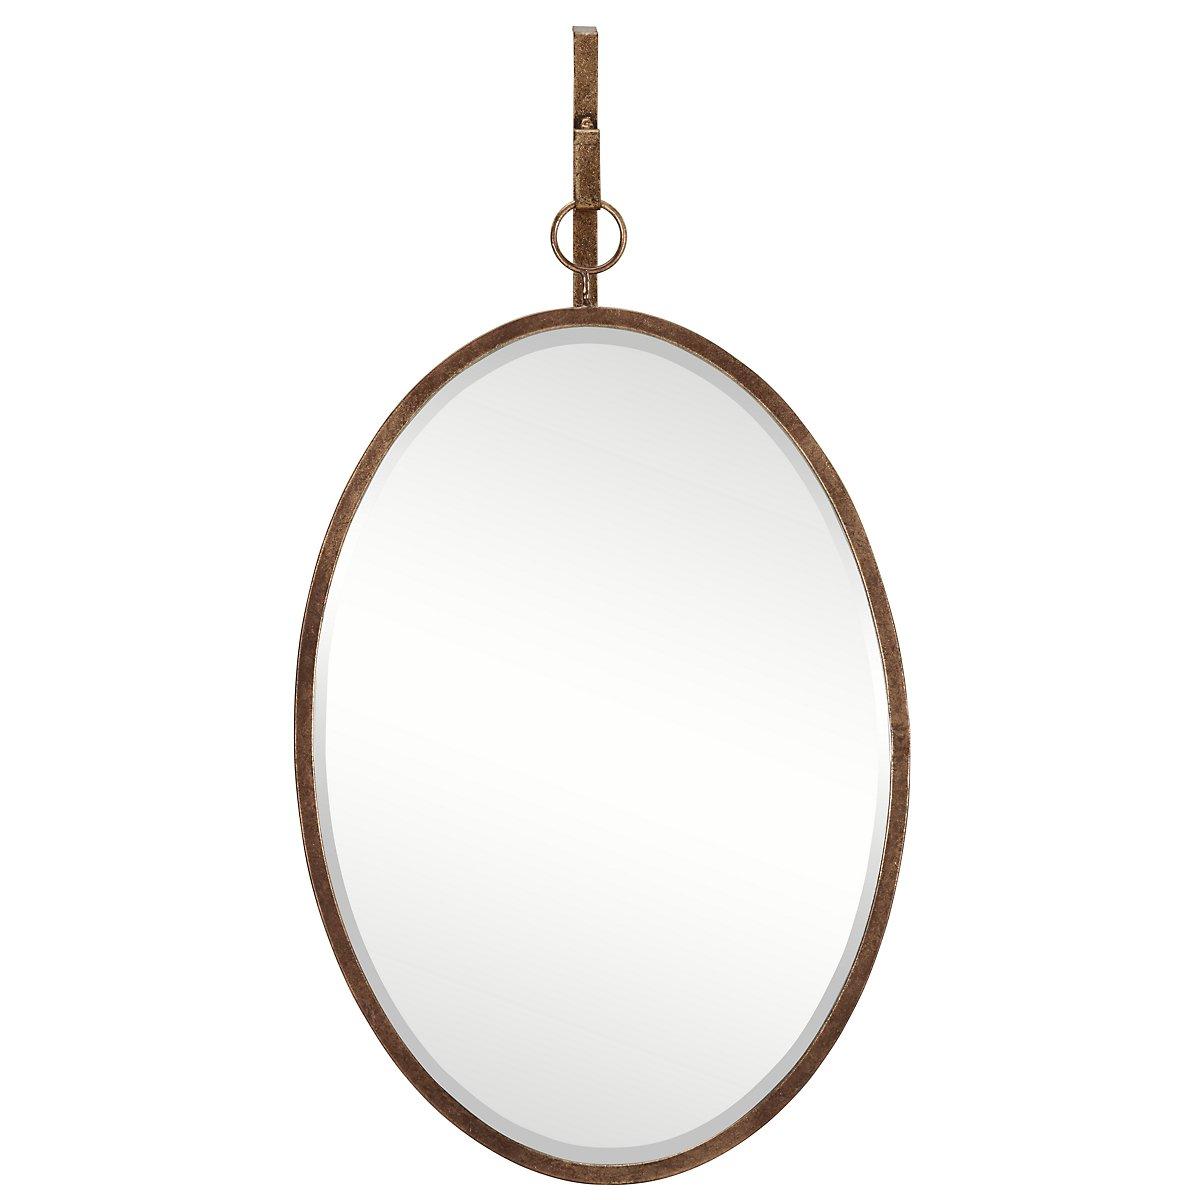 Ava Dark Gold Oval Mirror